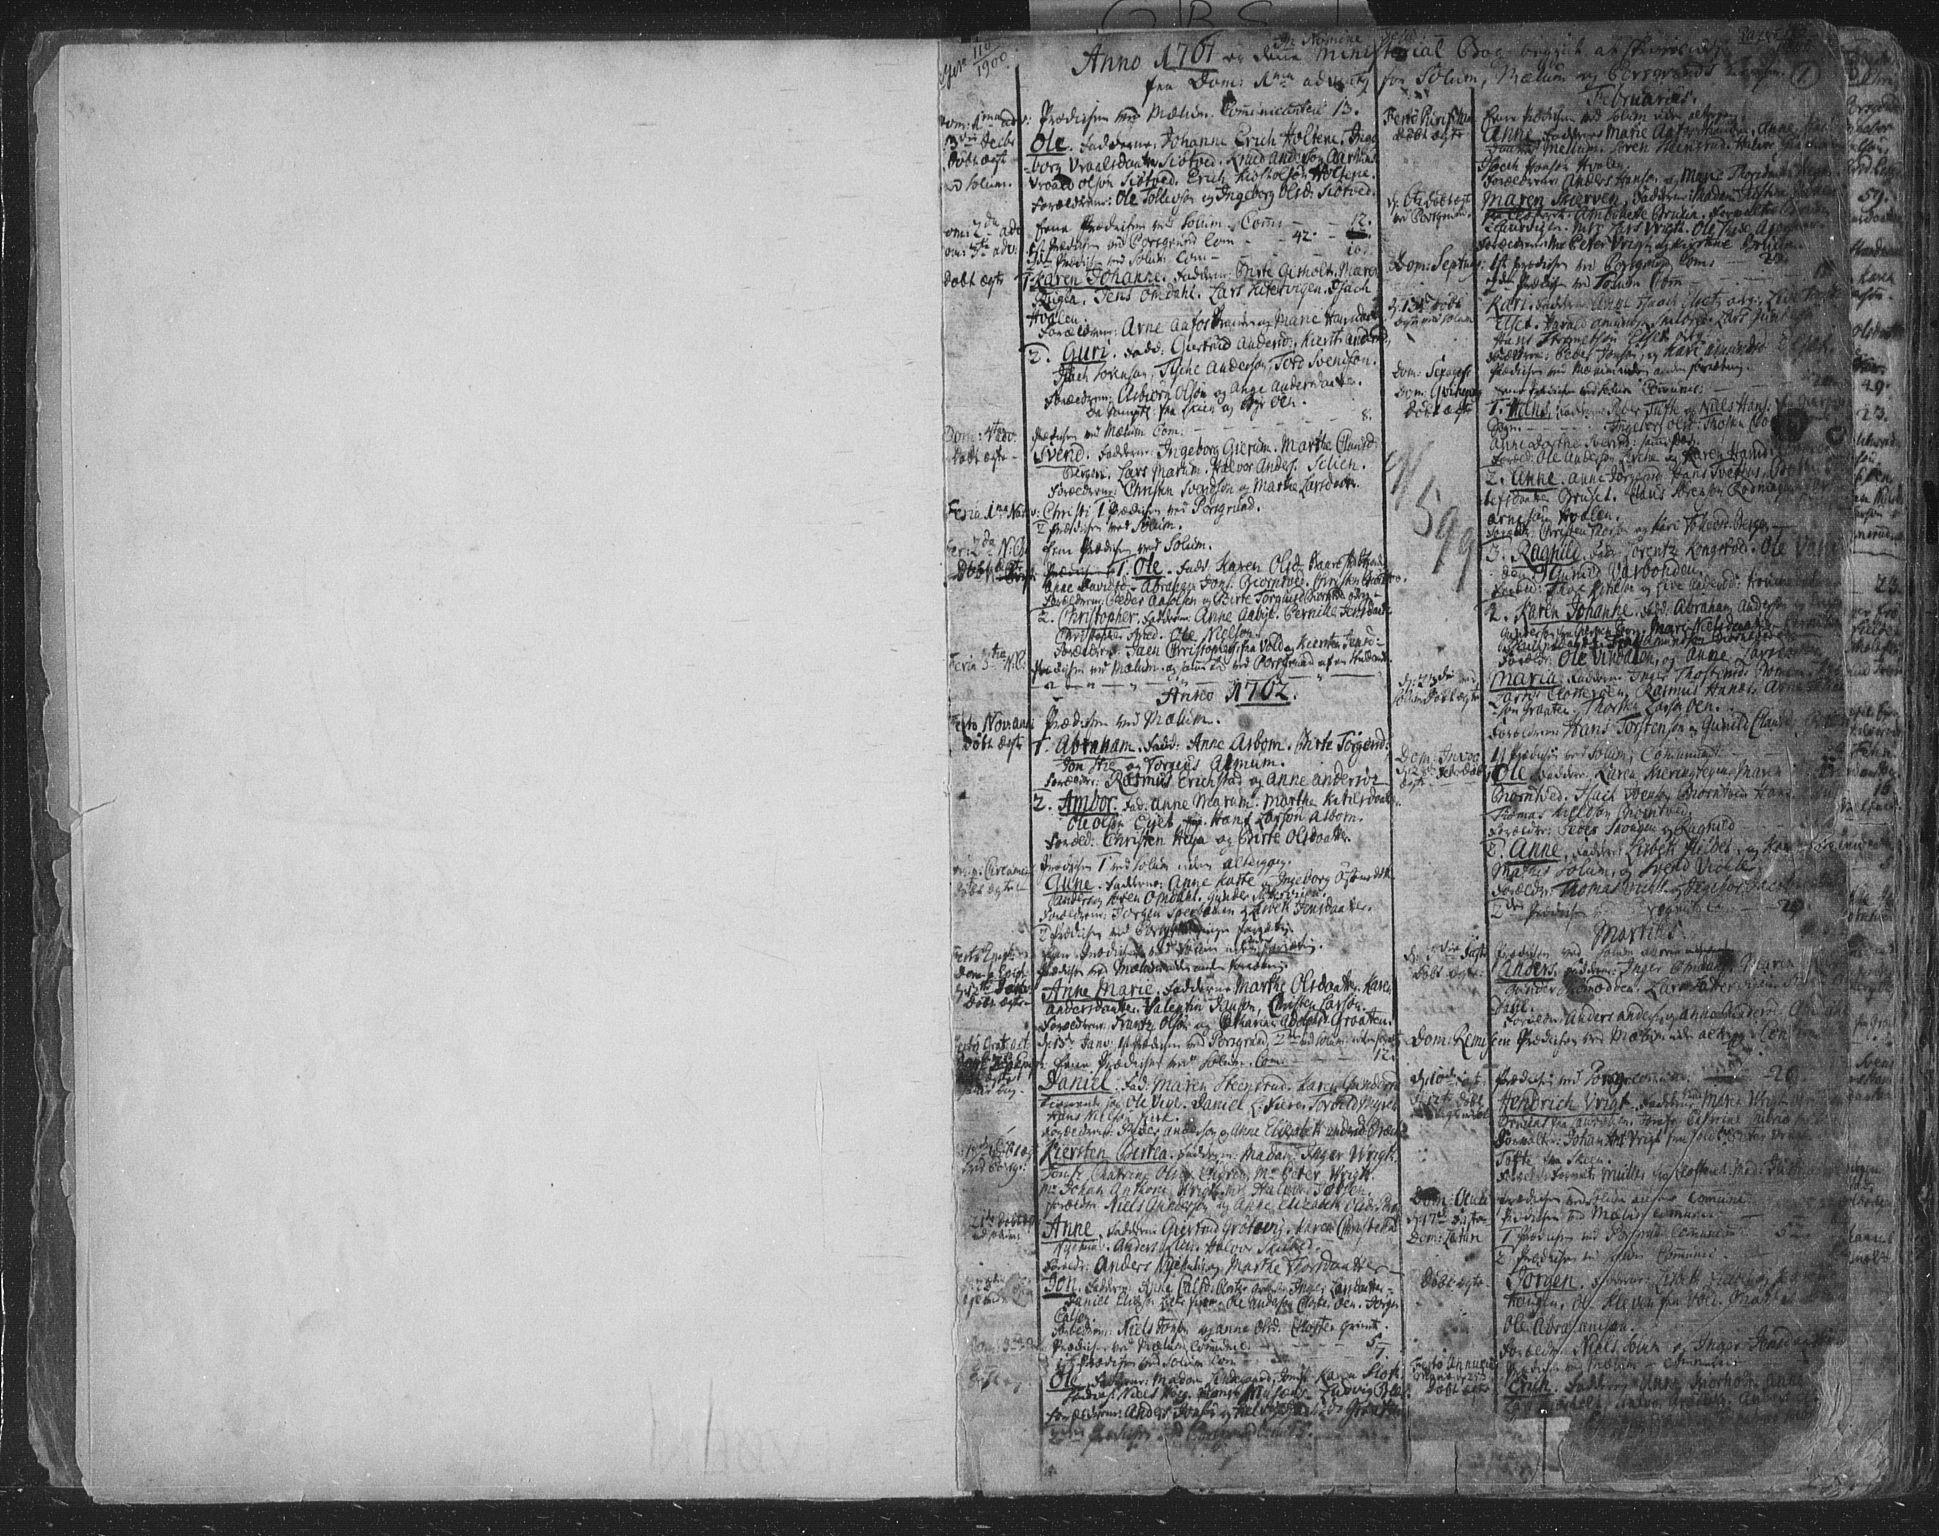 SAKO, Solum kirkebøker, F/Fa/L0003: Ministerialbok nr. I 3, 1761-1814, s. 0-1